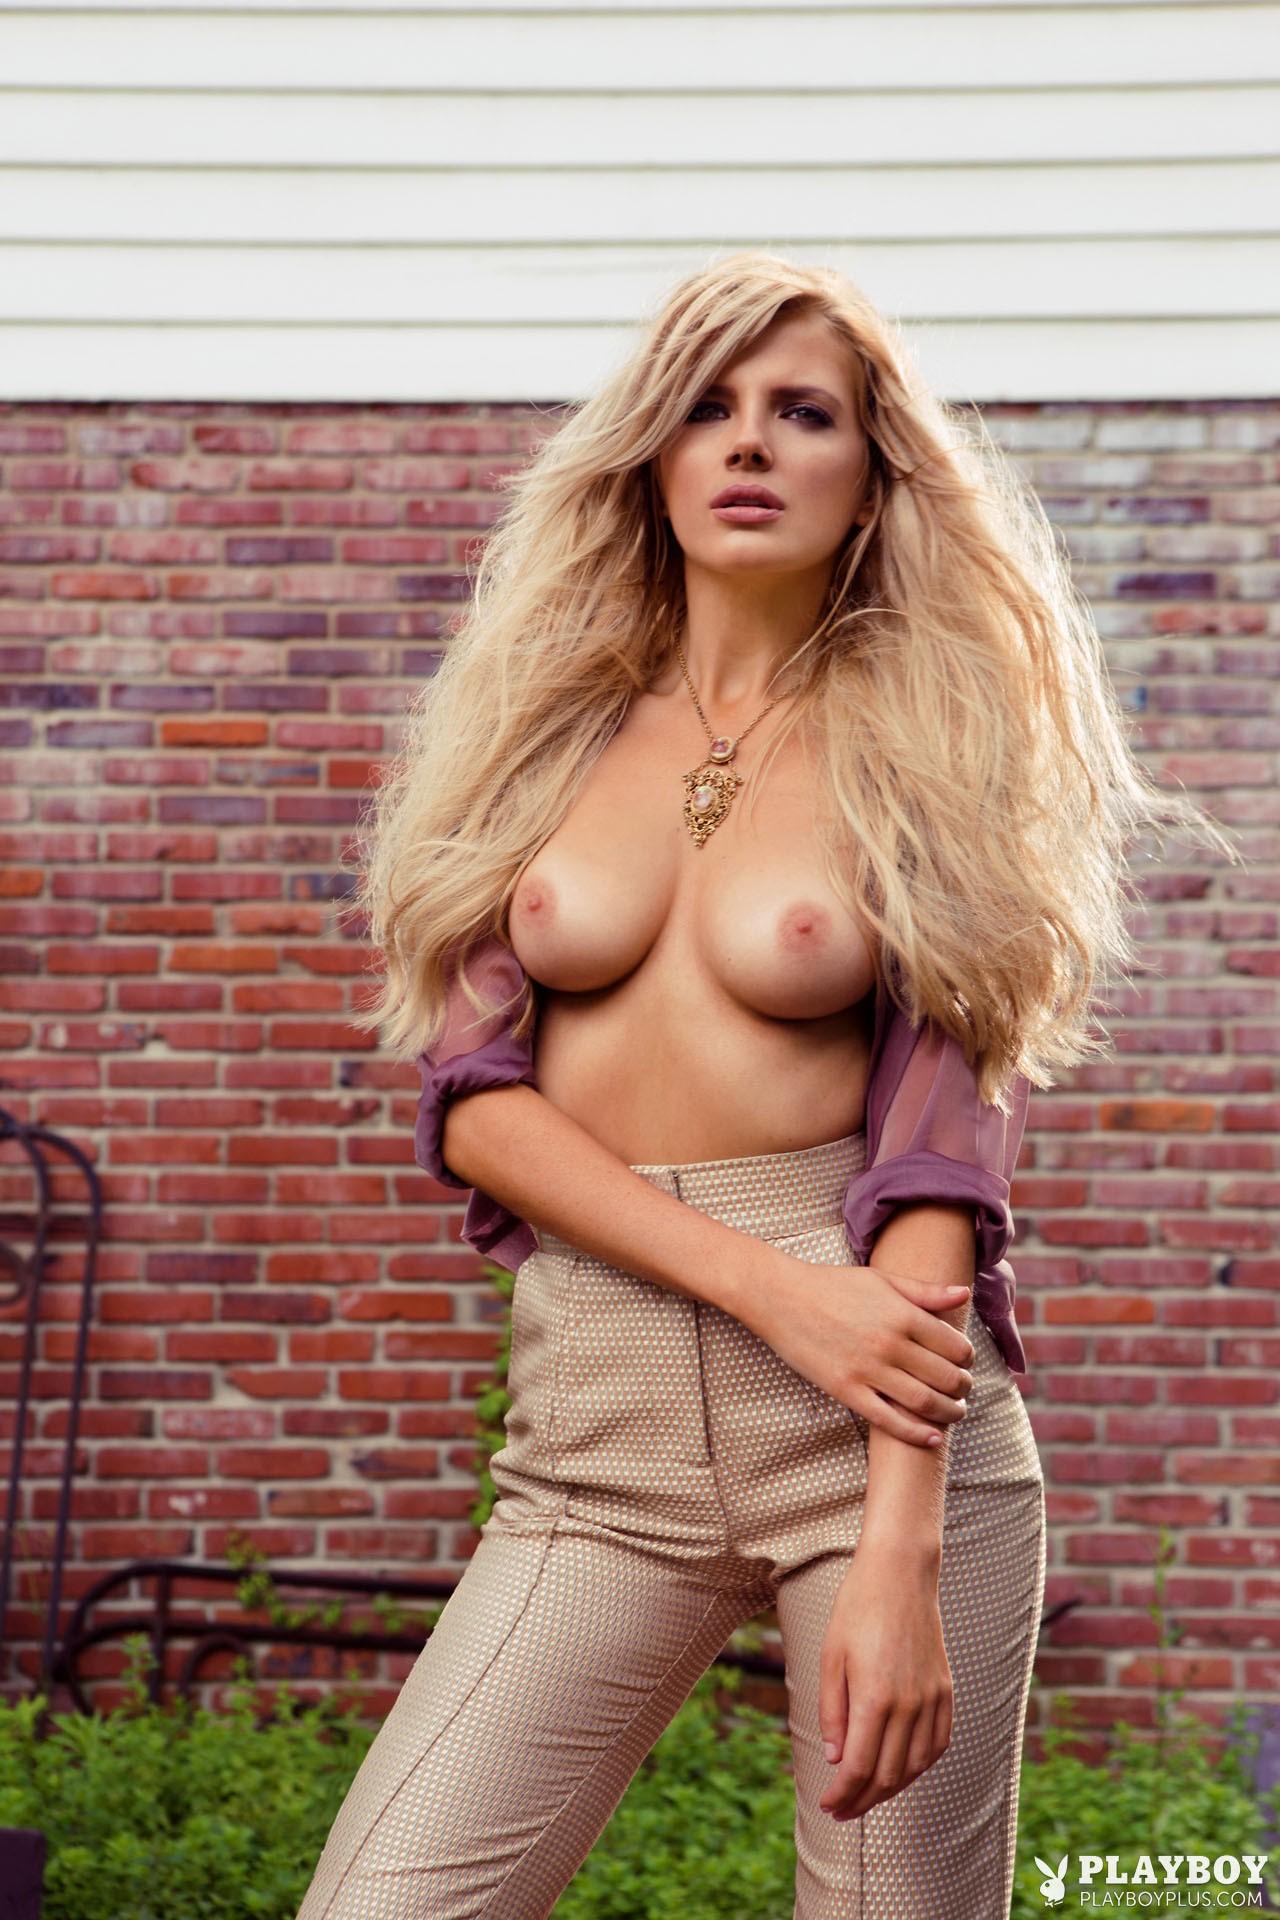 Playboy stephanie branton nude